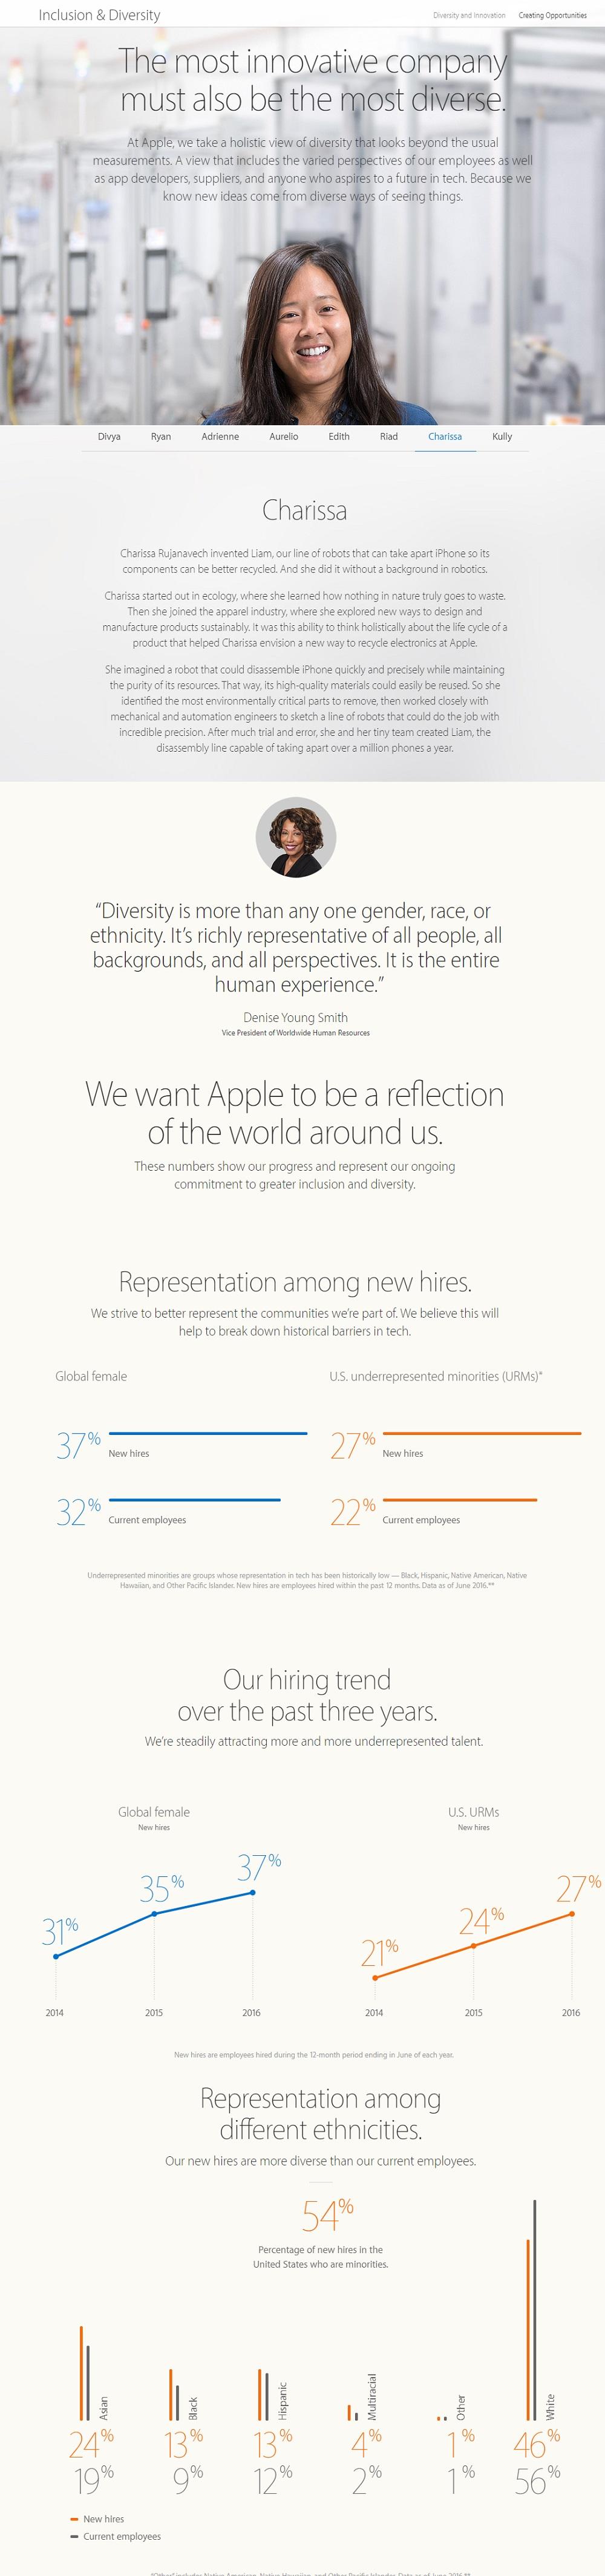 Apple Company Diversity Page